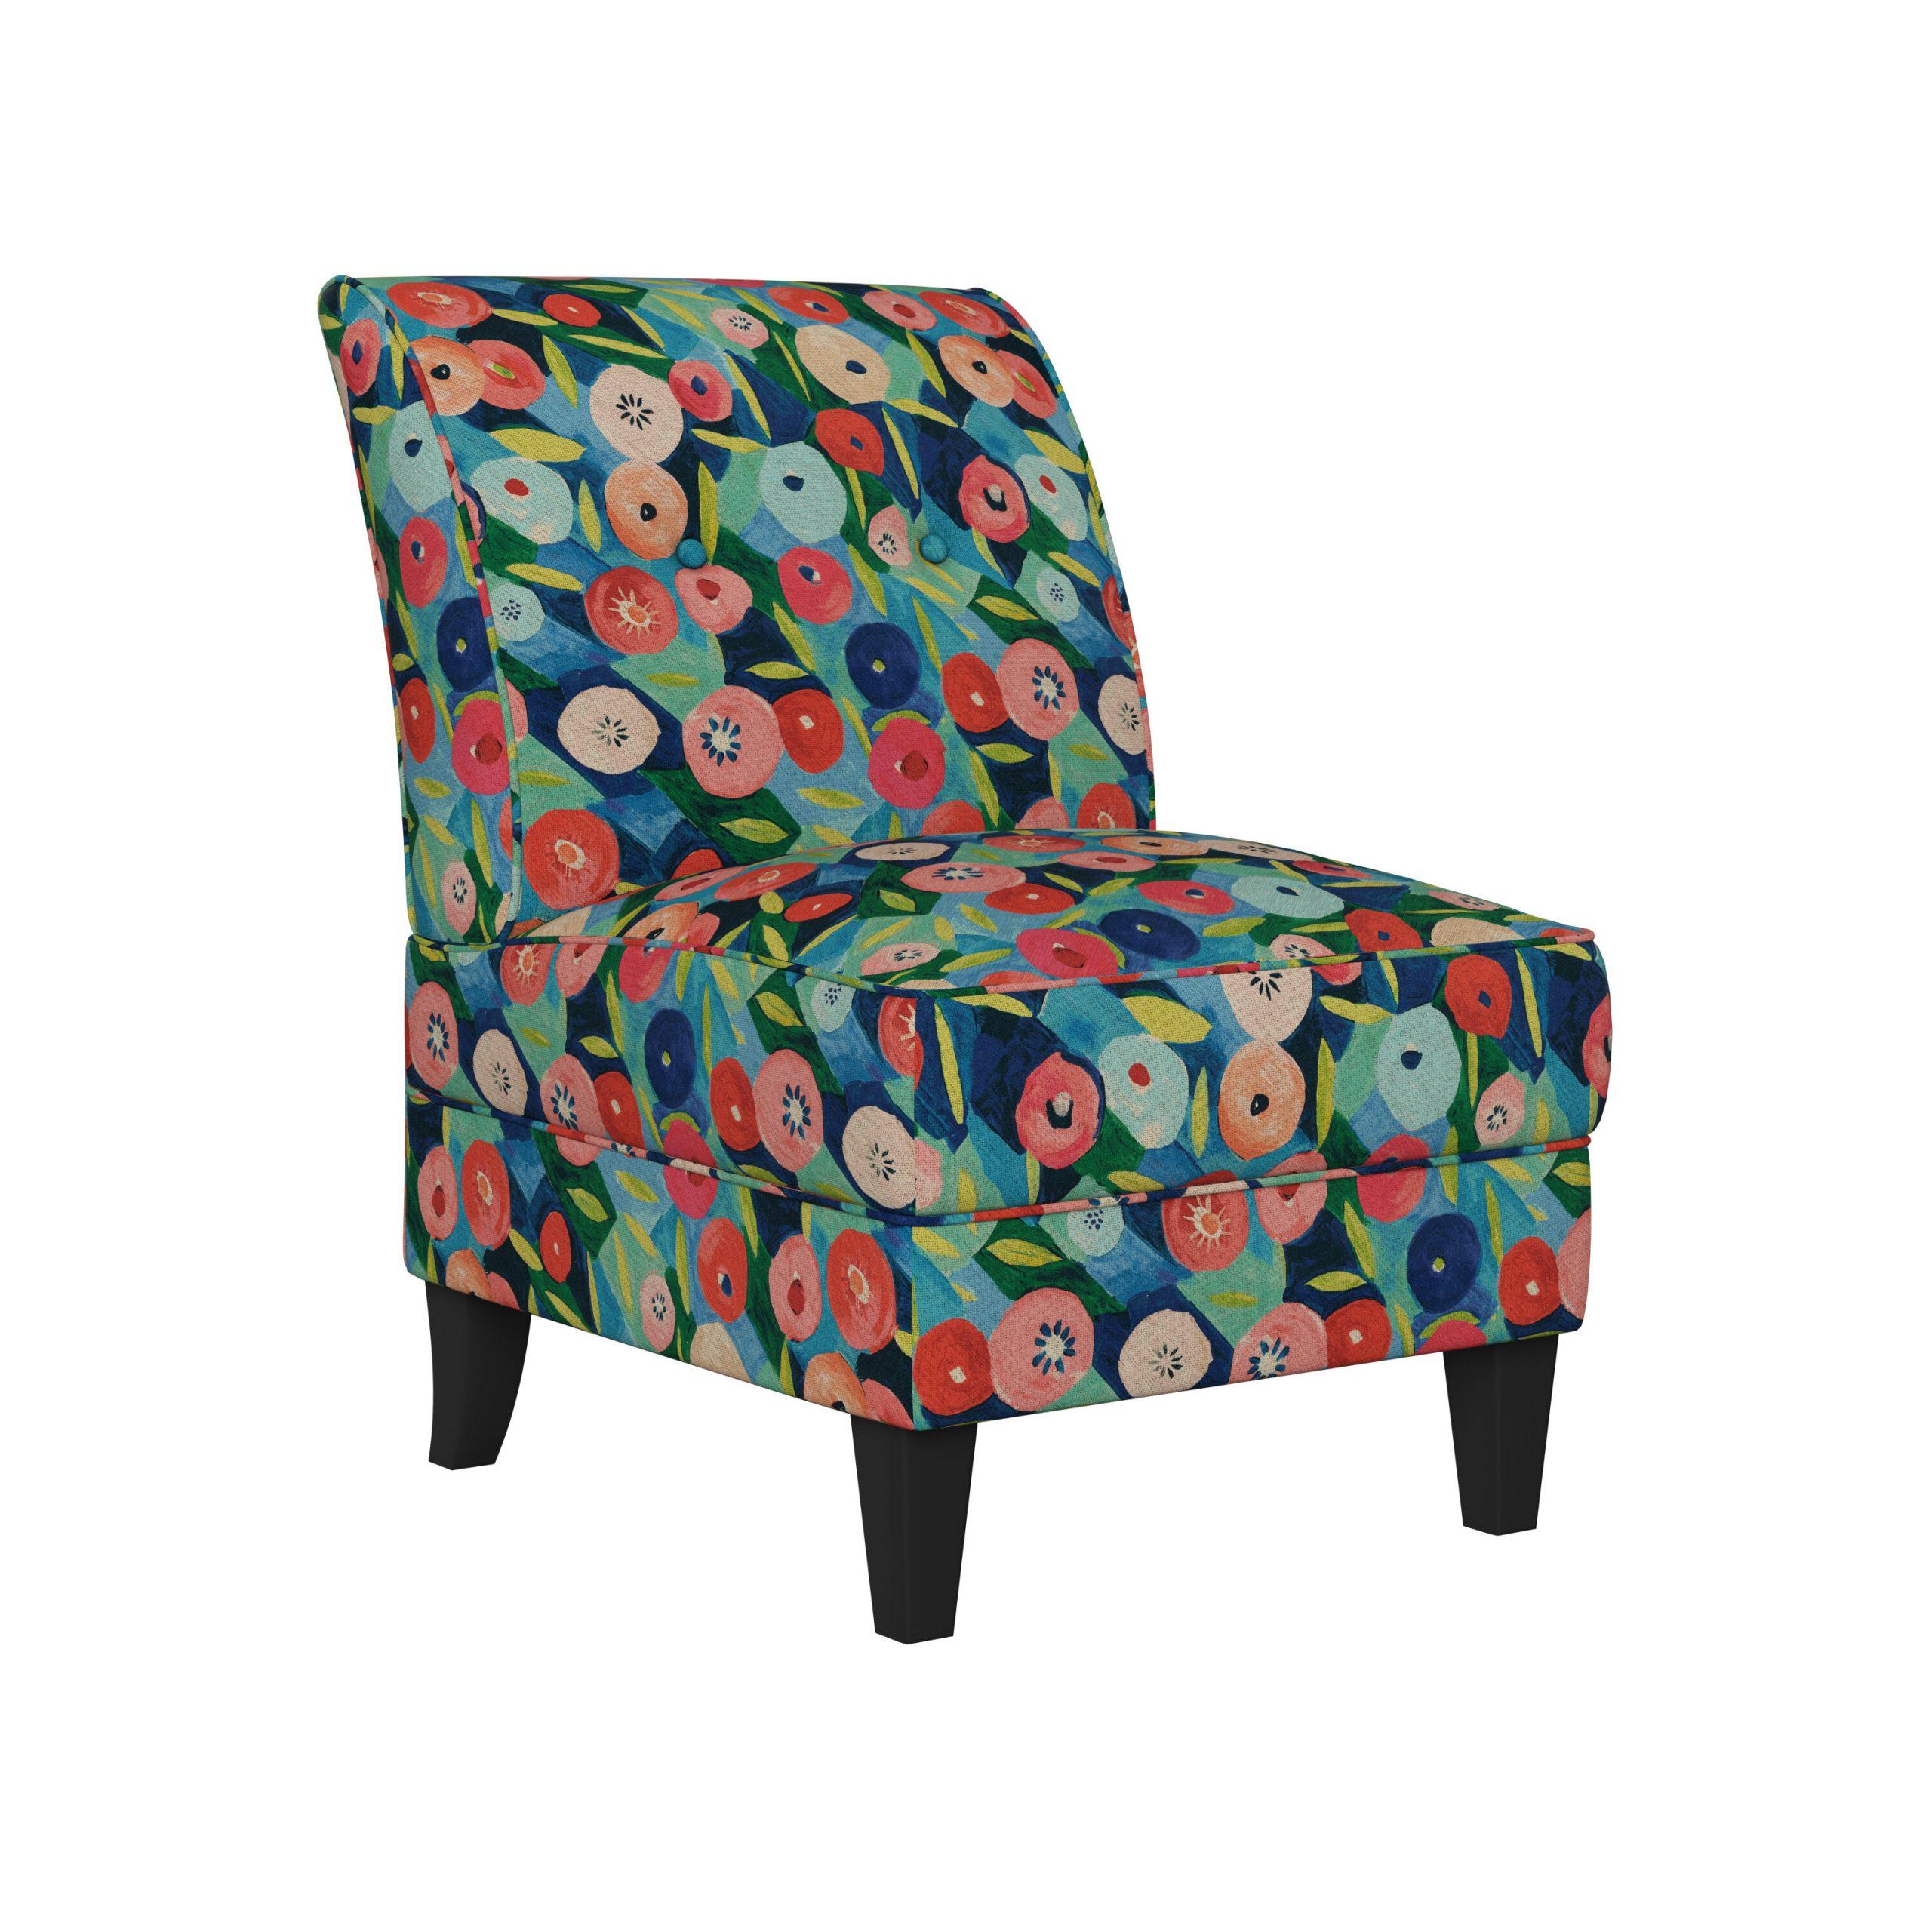 Best Abbaas Slipper Chair | Furniture Online Within Easterling Velvet Slipper Chairs (View 12 of 15)